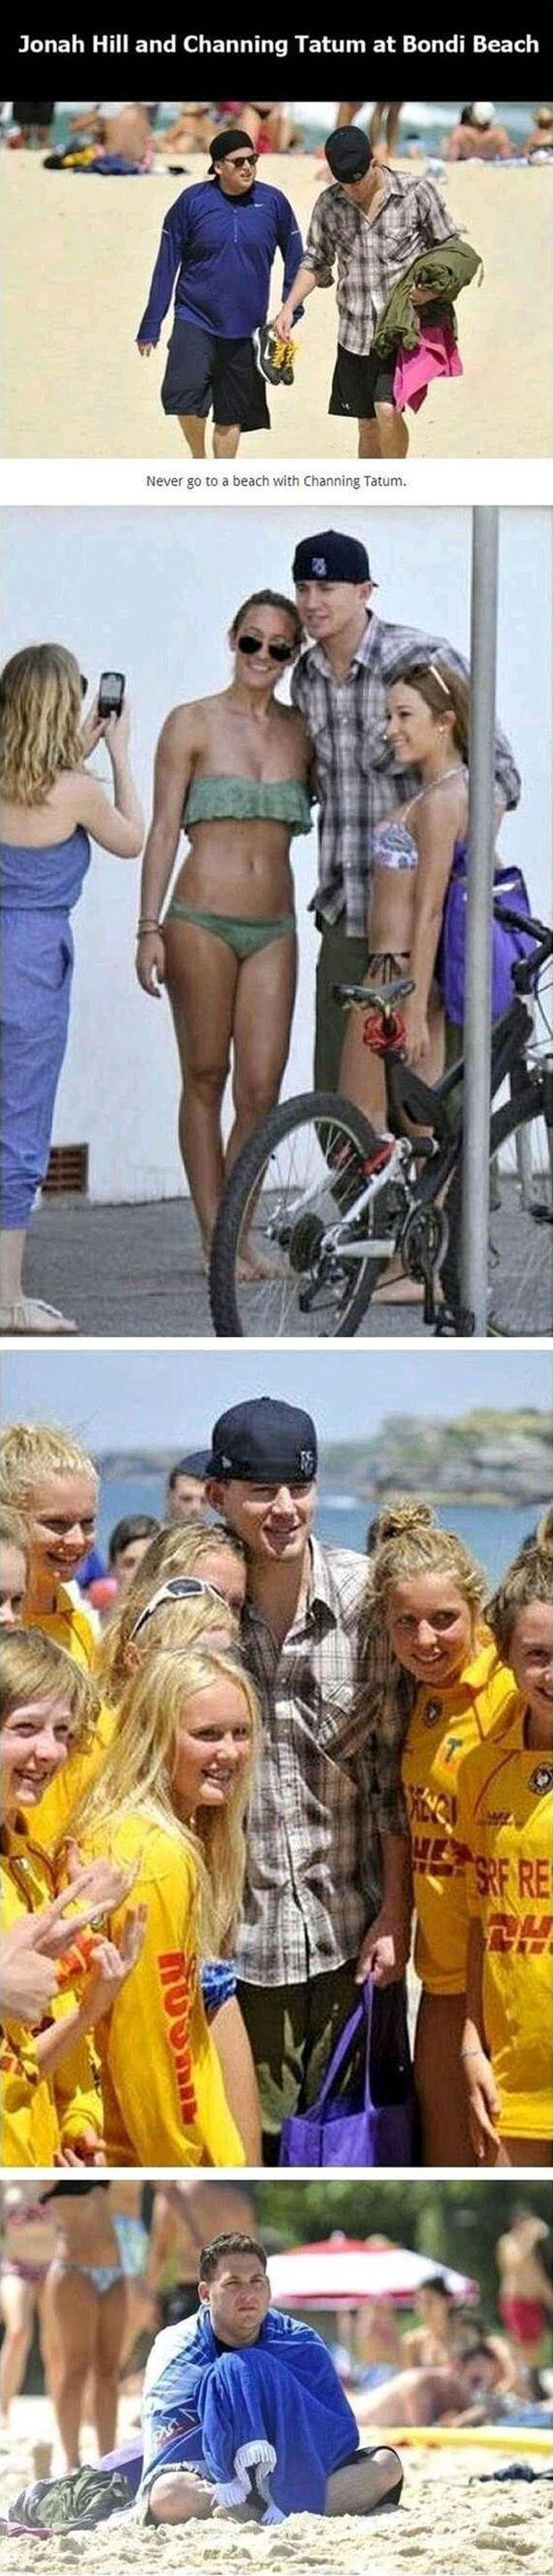 Channing Tatum at Bondi Beach, I think I just died.